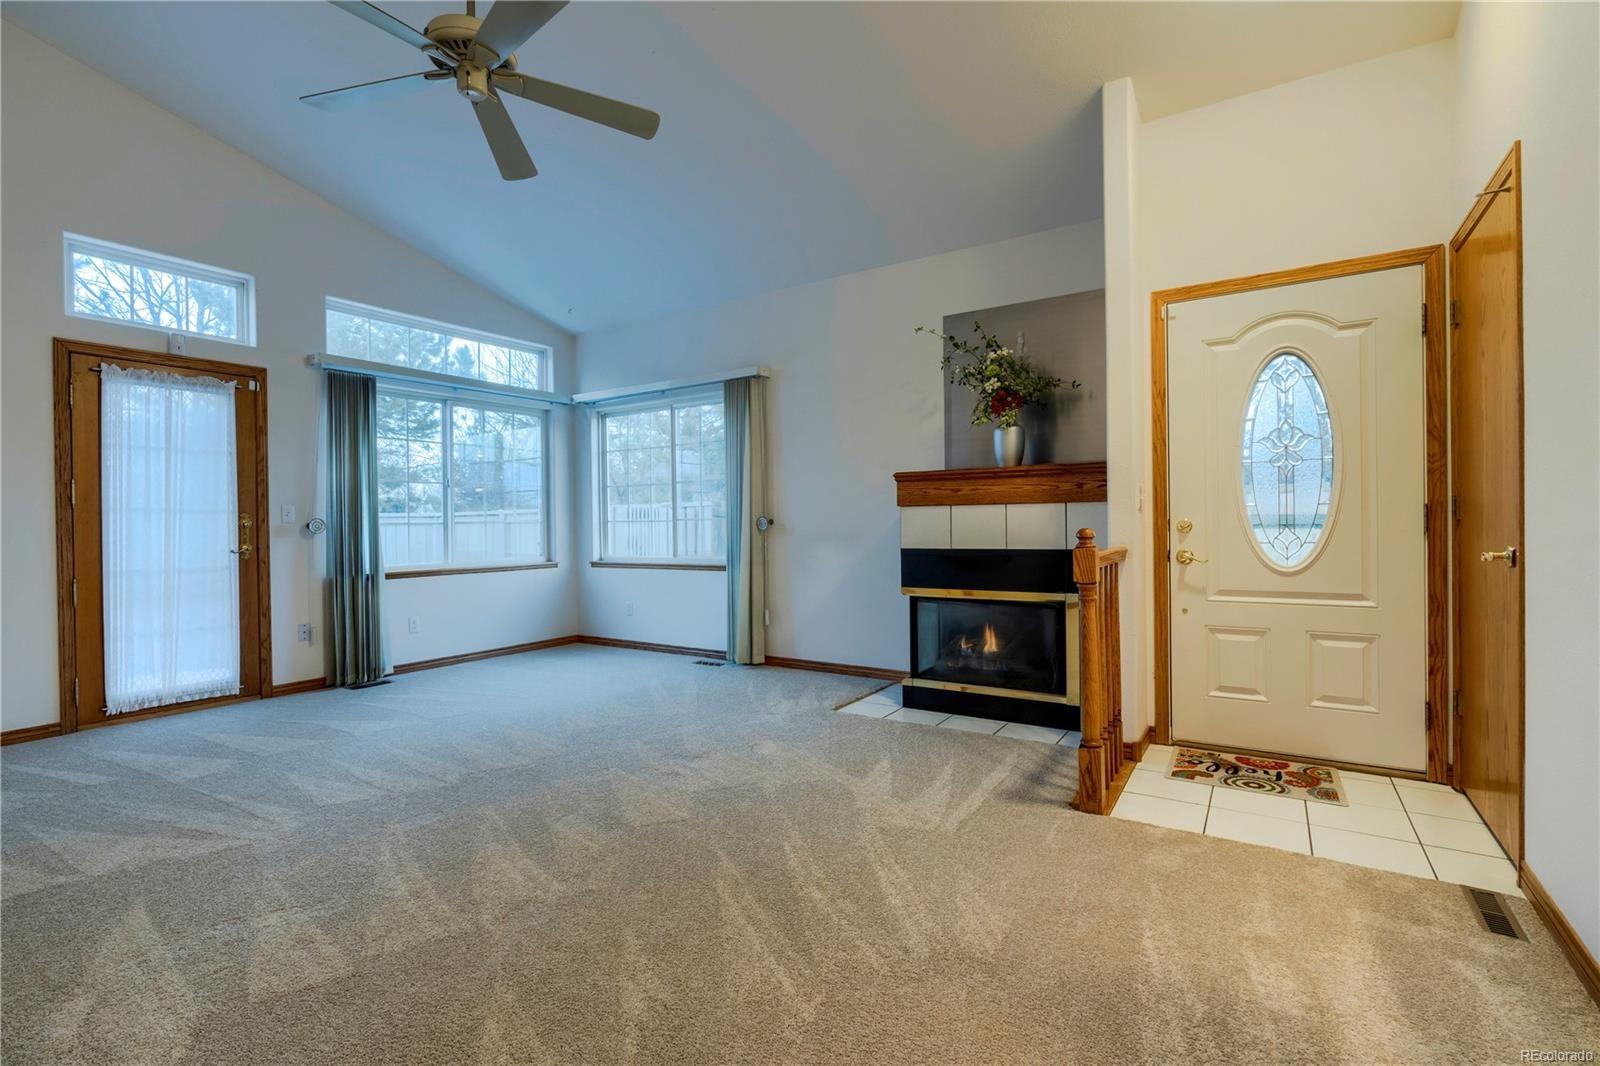 MLS# 7511958 - 3 - 900 Arbor Avenue #6, Fort Collins, CO 80526